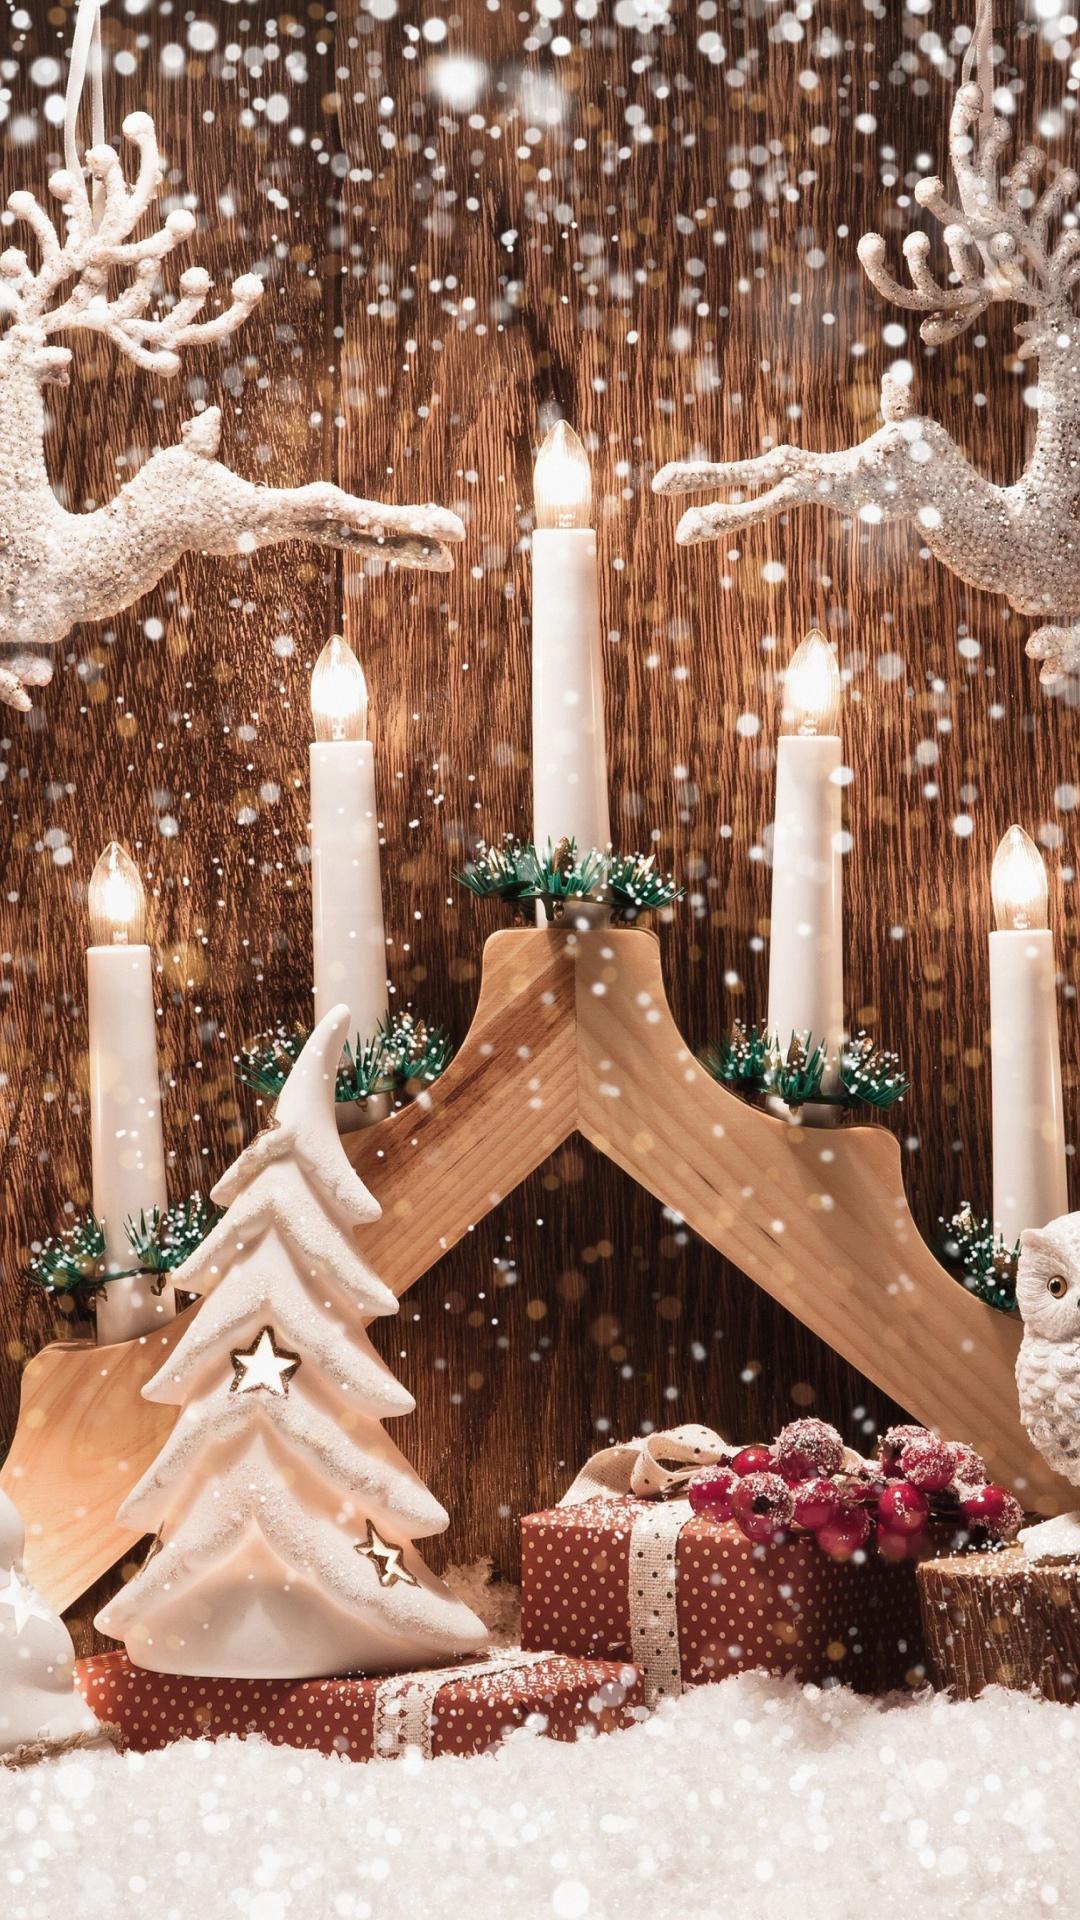 Картинки с рождеством на айфон